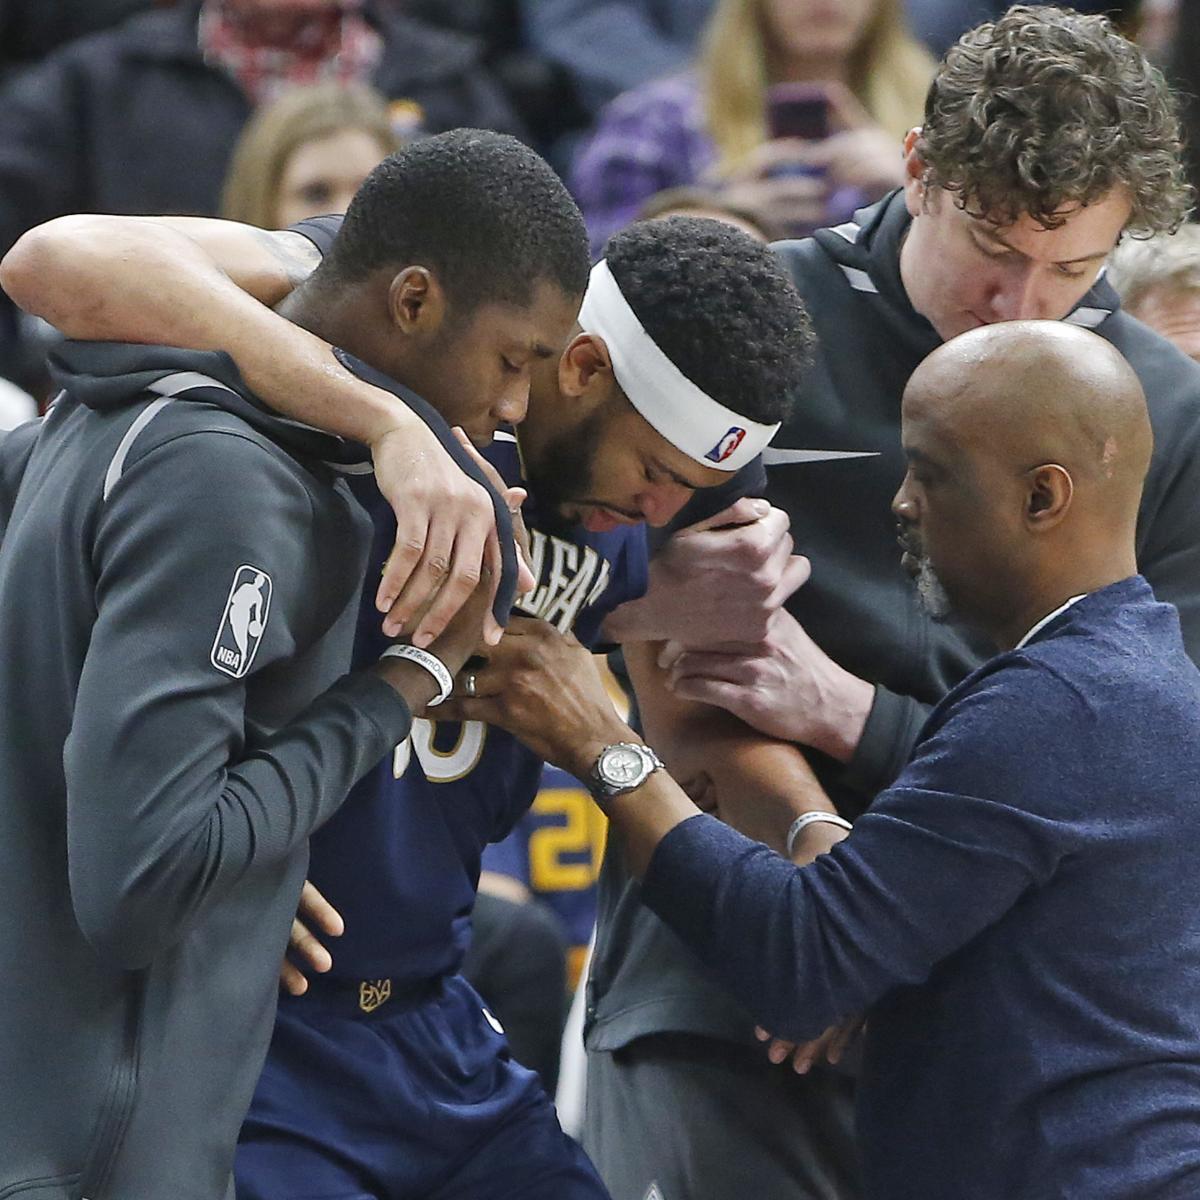 Portland Trail Blazers Injury News: Anthony Davis Ruled Out Vs. Trail Blazers With Pelvis